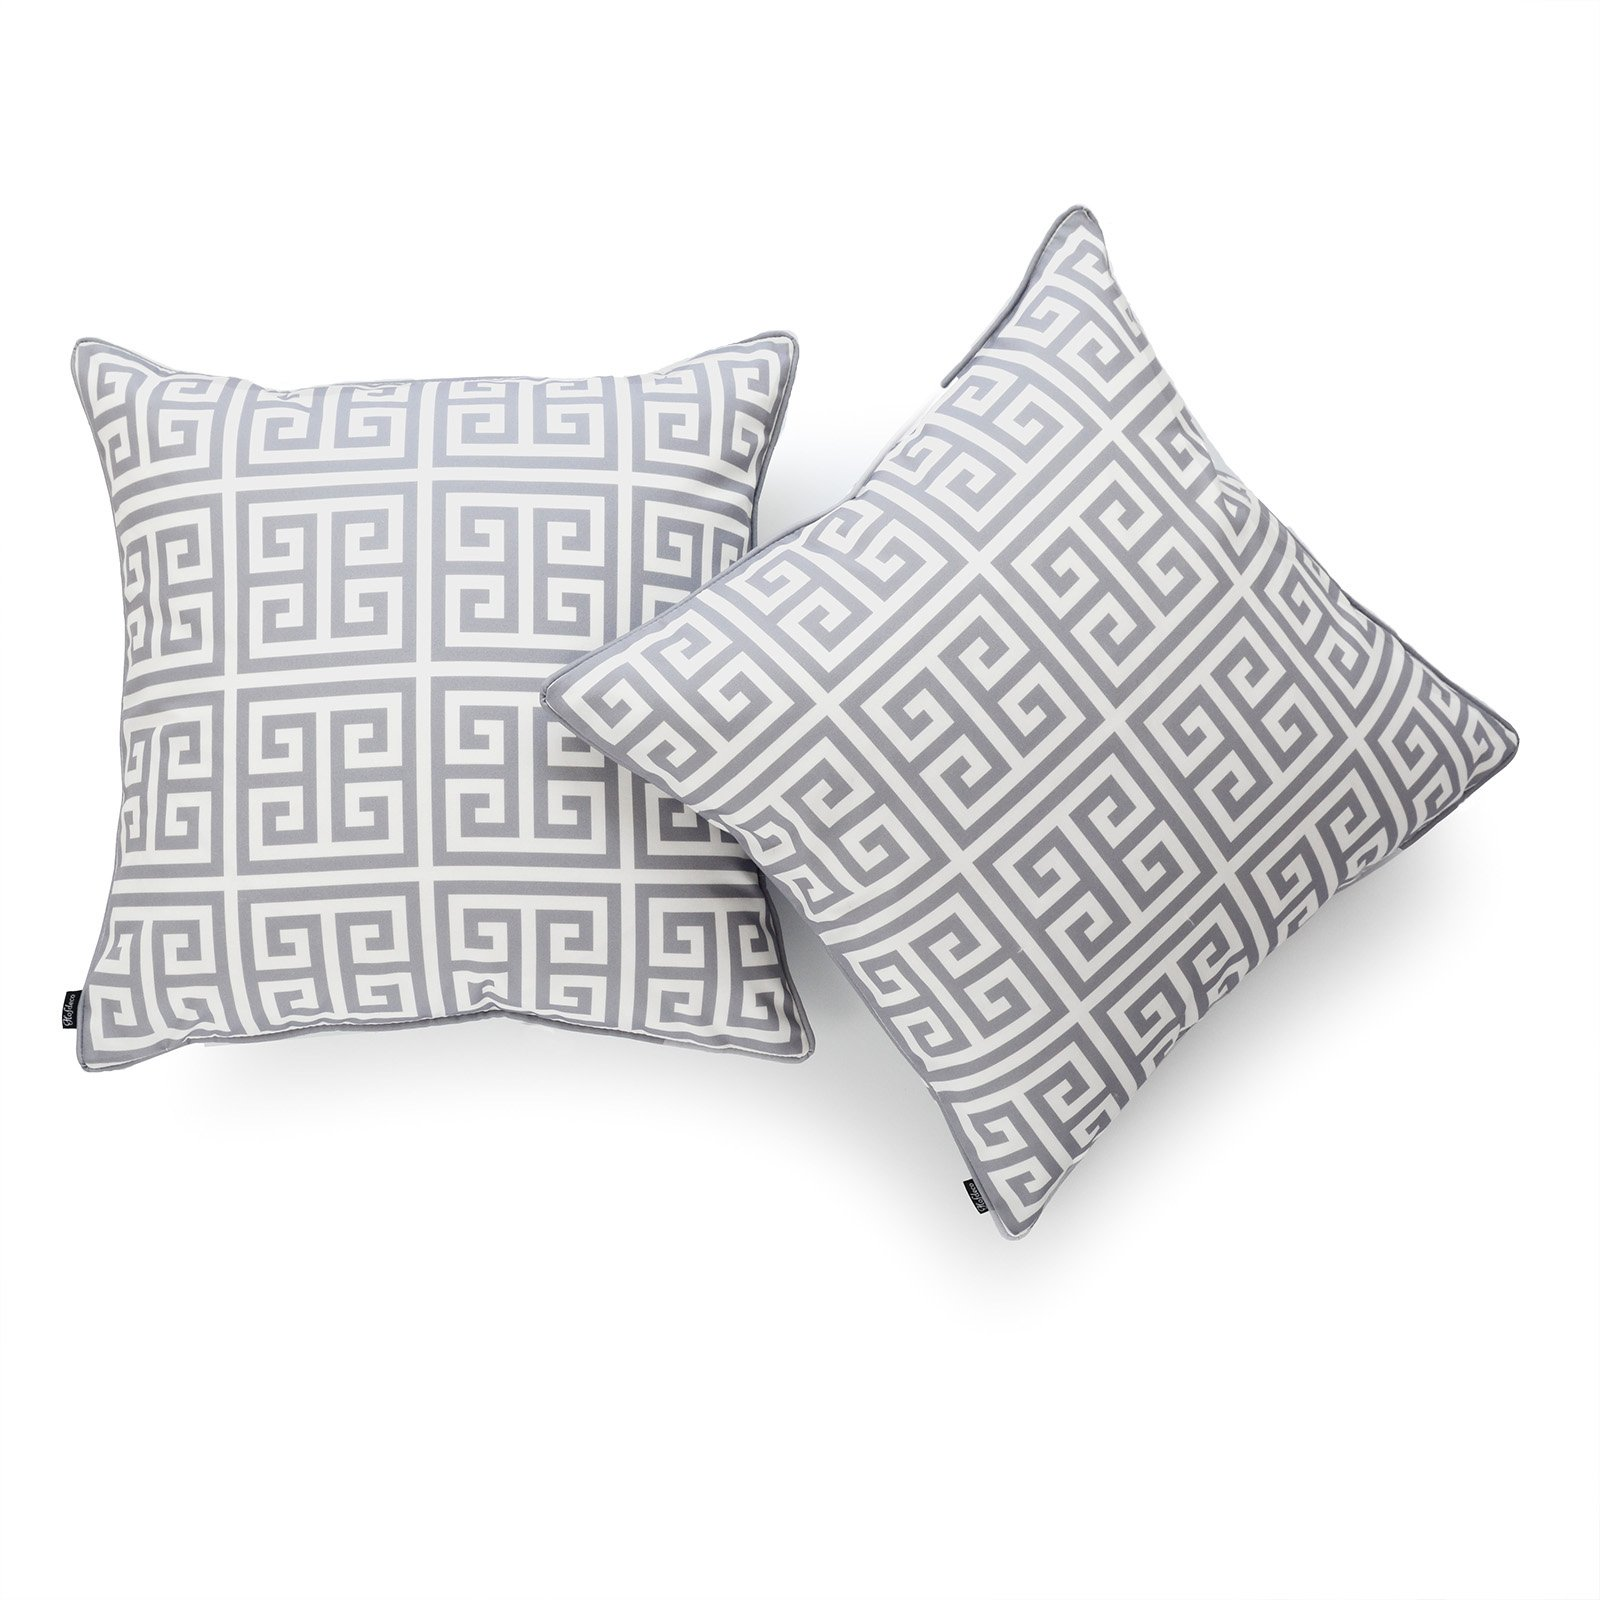 Hofdeco Decorative Throw Pillow Cover INDOOR OUTDOOR WATER RESISTANT Canvas Modern Grey Greek Key 18''x18'' Set of 2